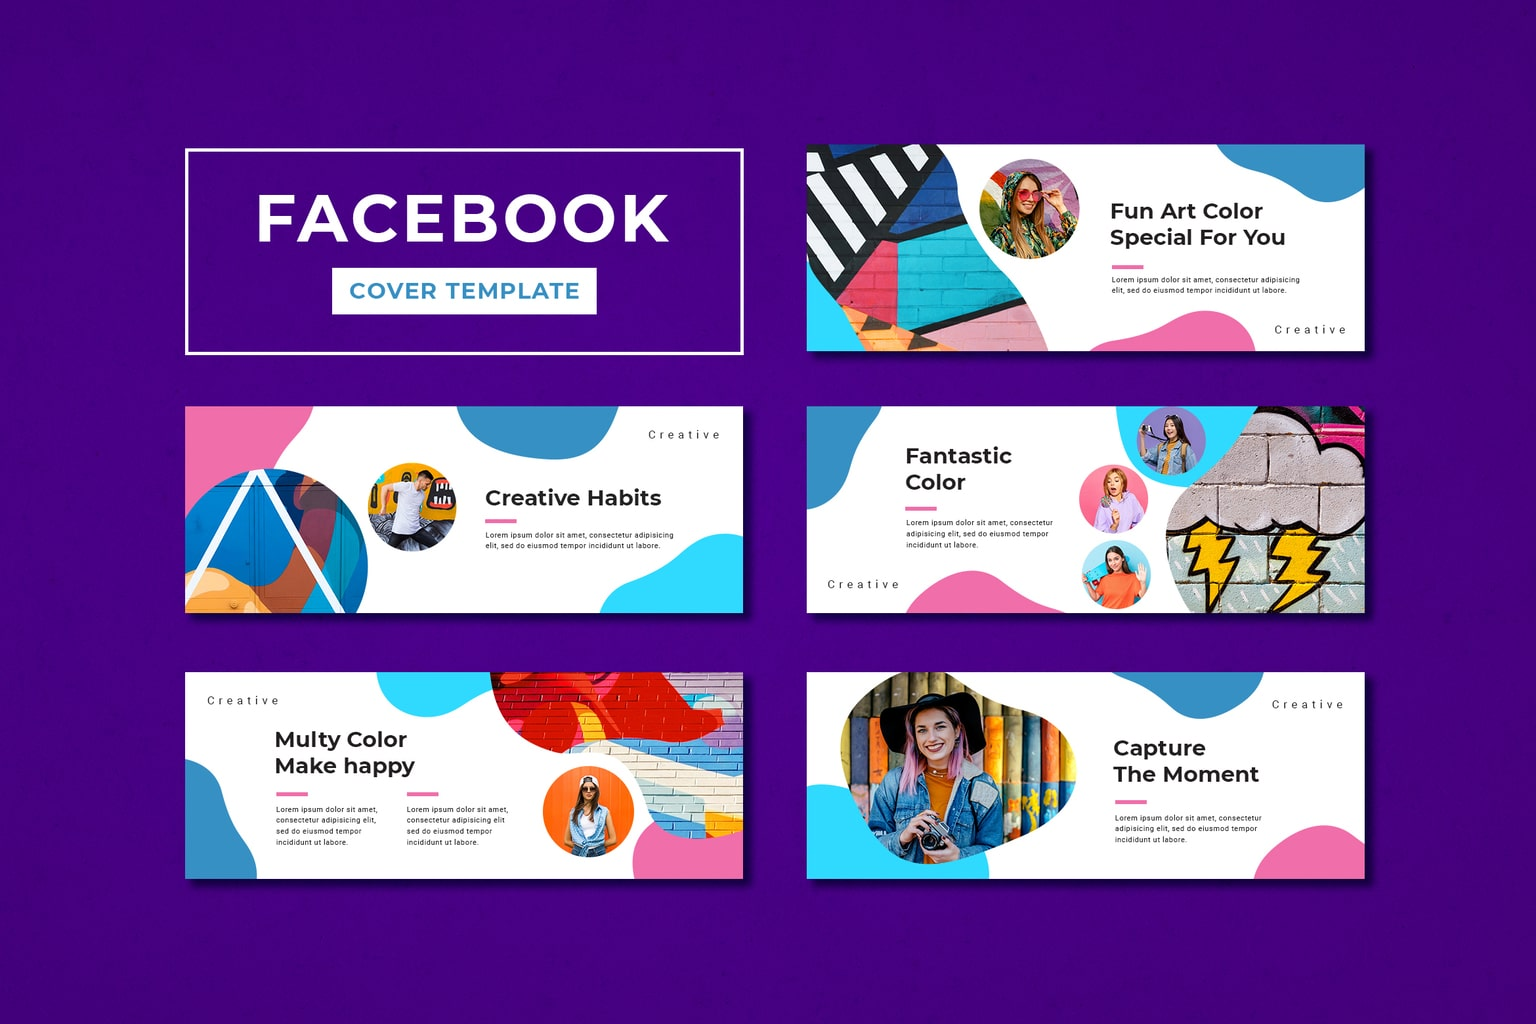 facebook cover fun and creative arts